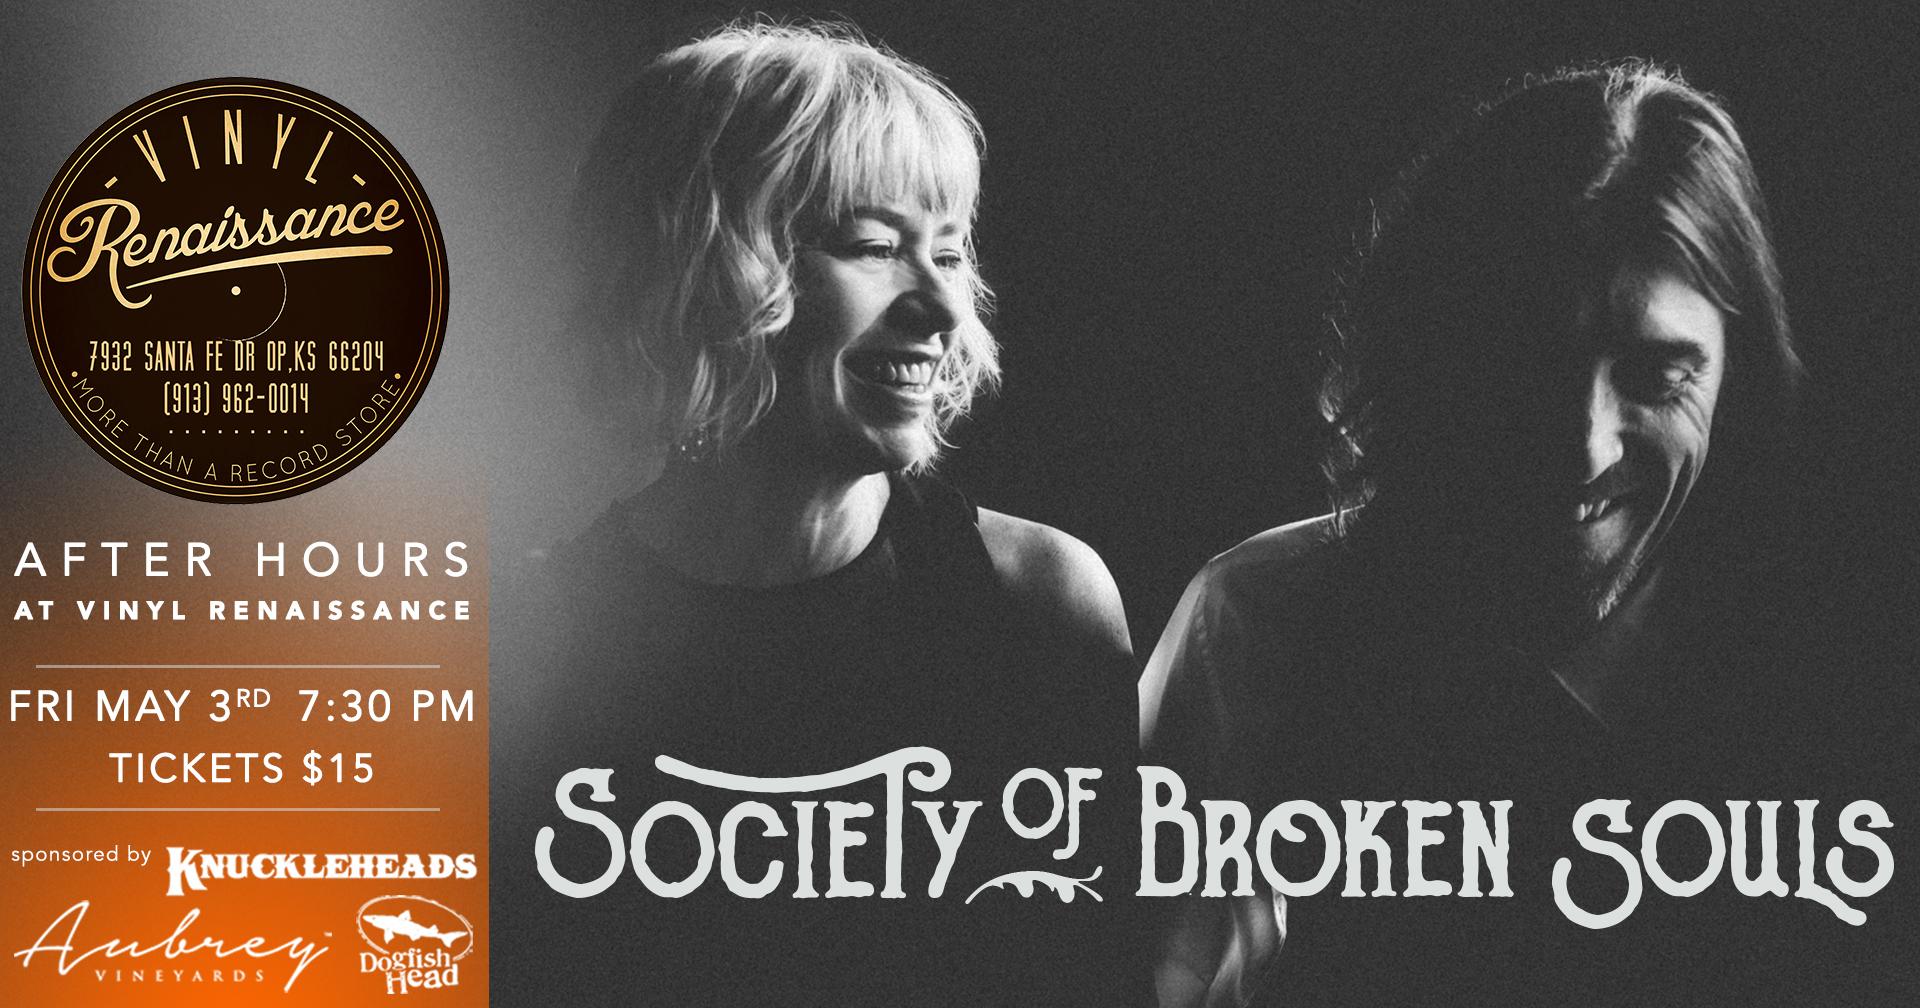 Society Of Broken Souls - 05/03/2019 After Hours at Vinyl Renaissance